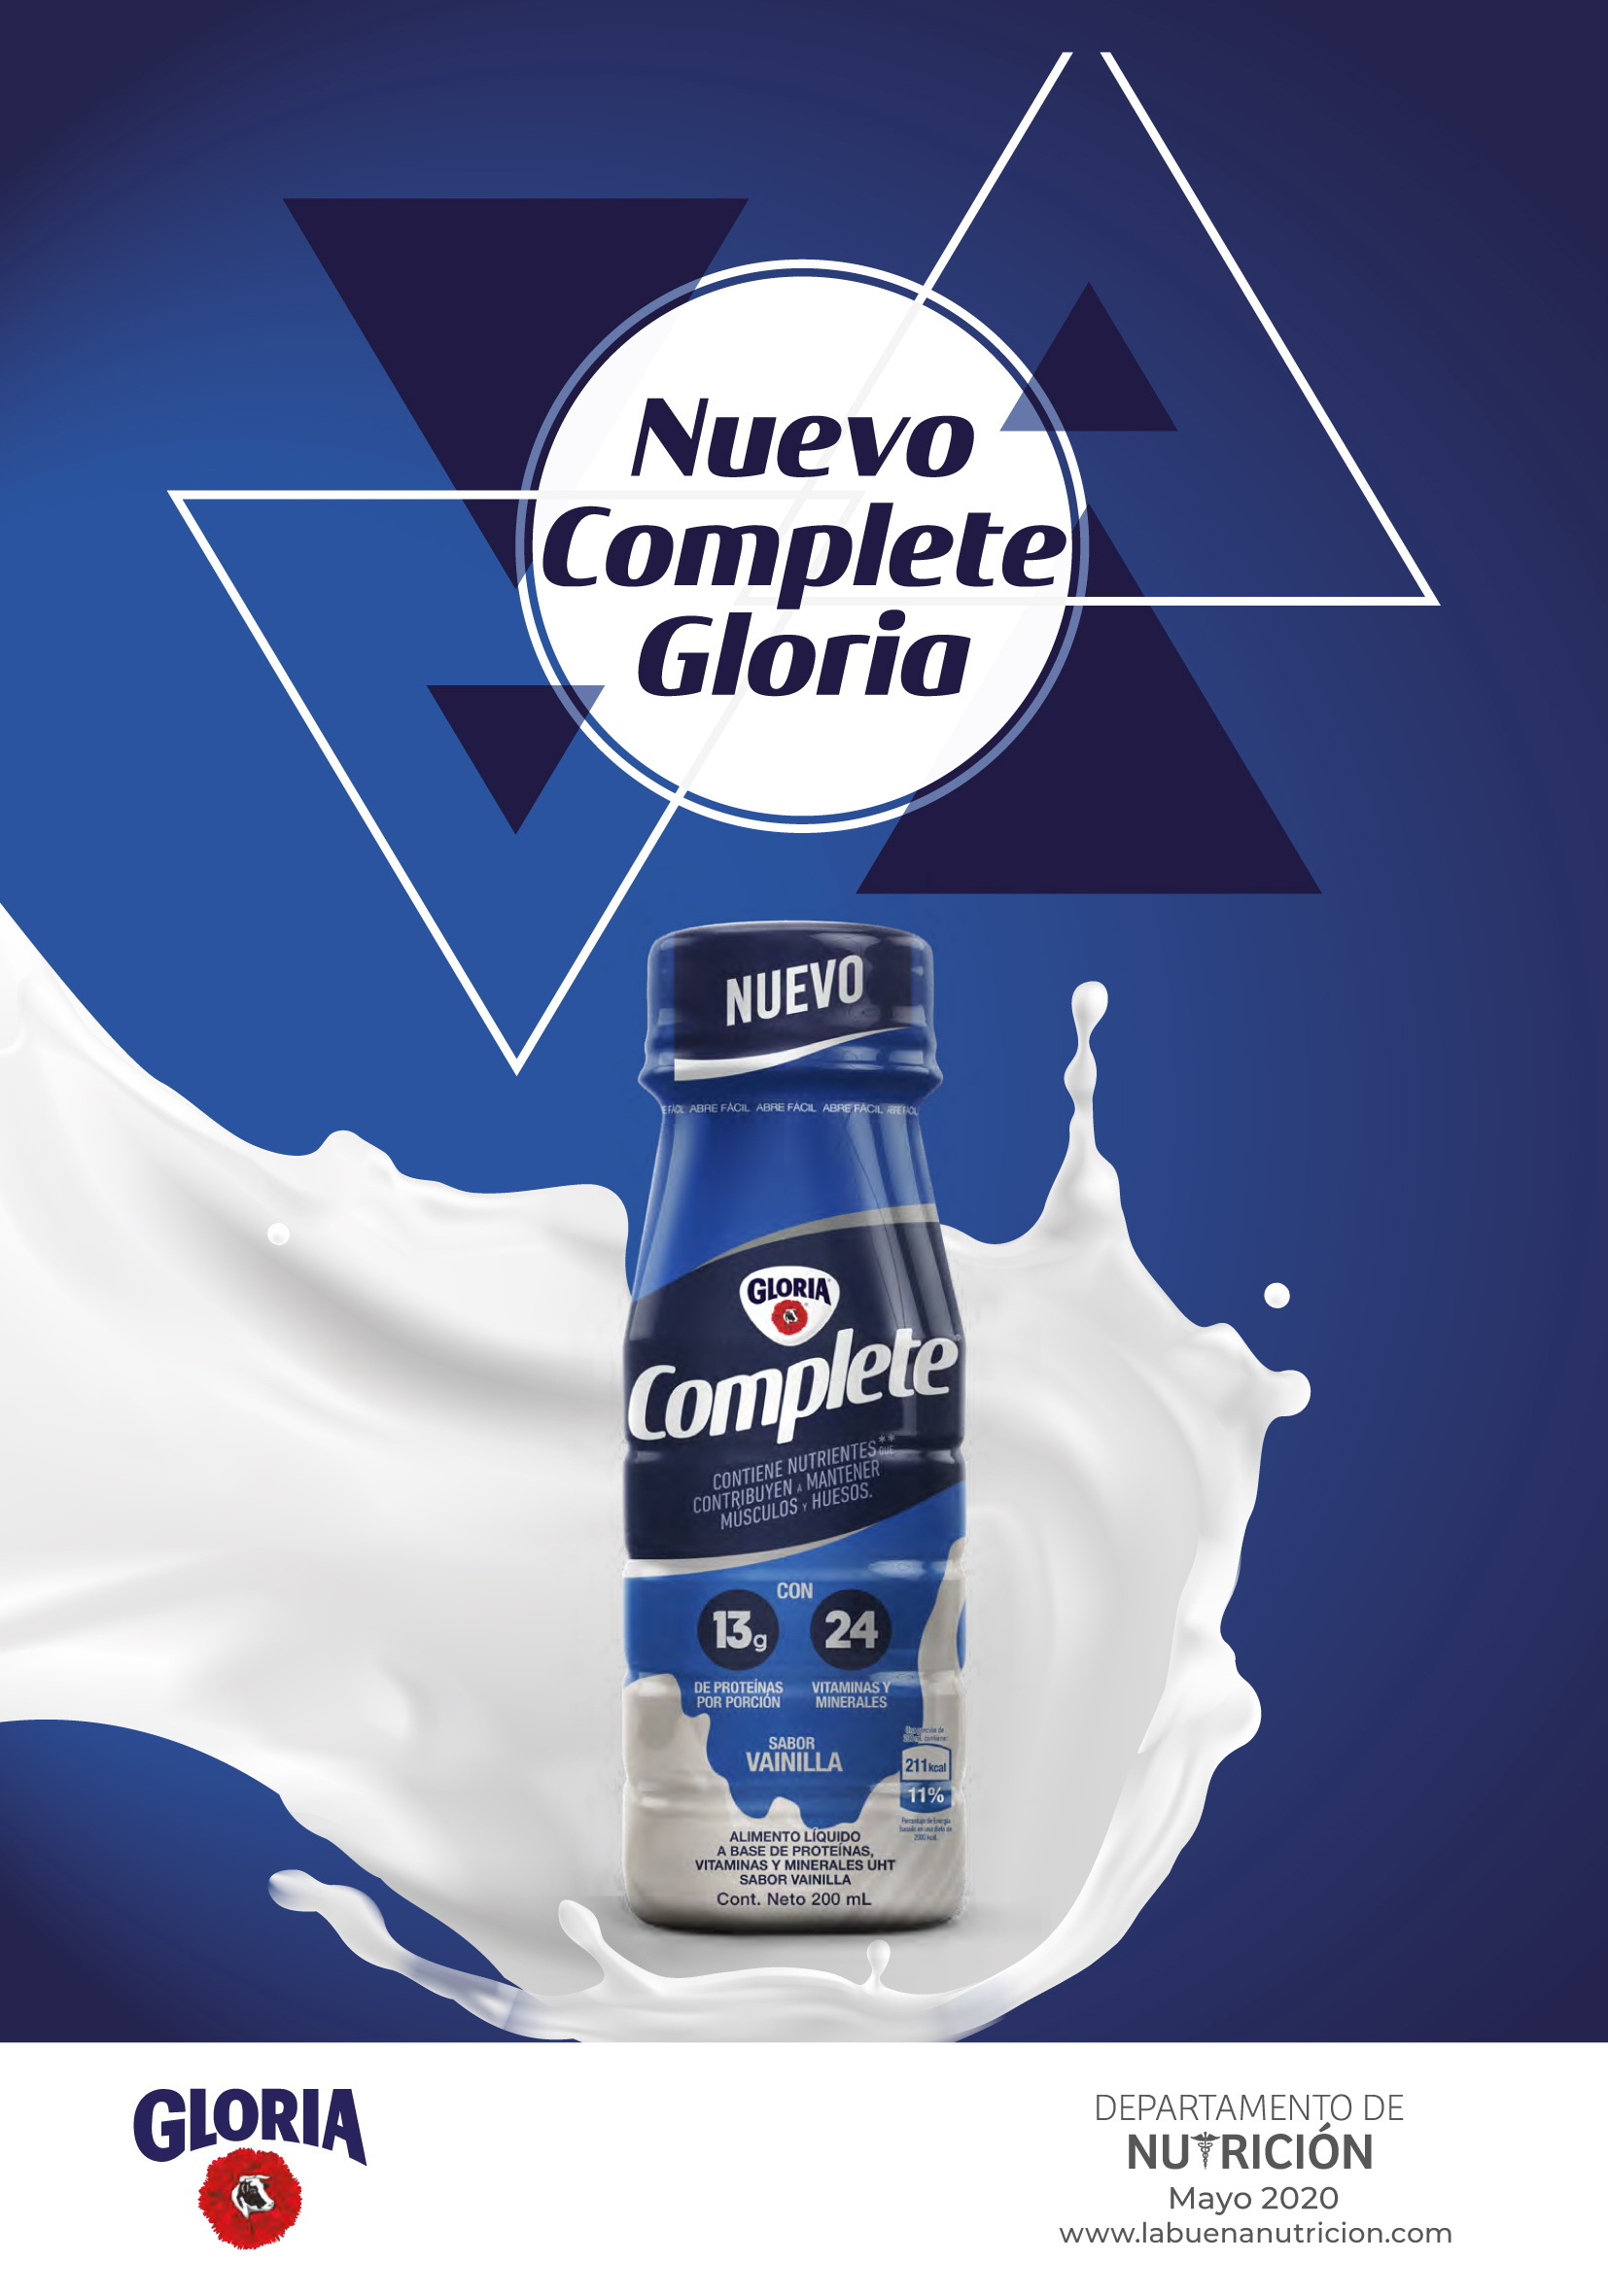 Nuevo Complete Gloria